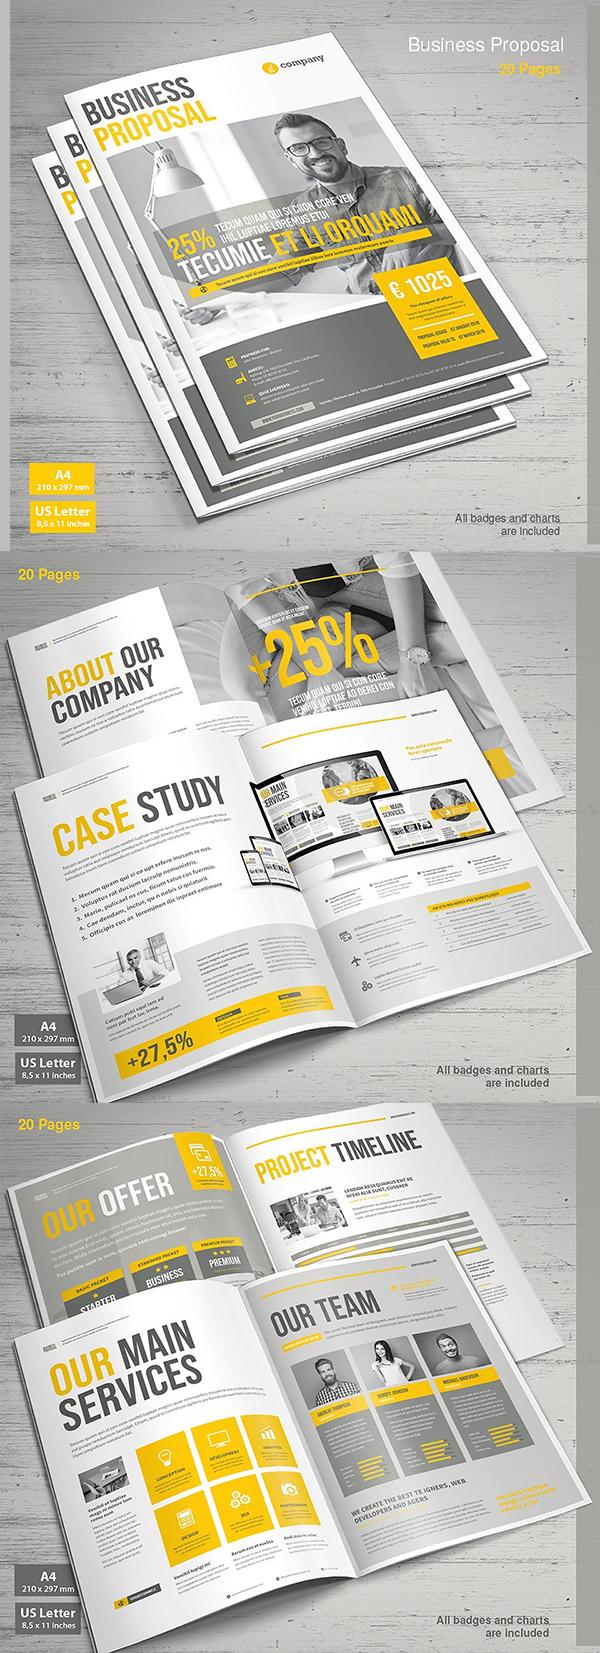 Professional Business Proposal Templates Design - 15